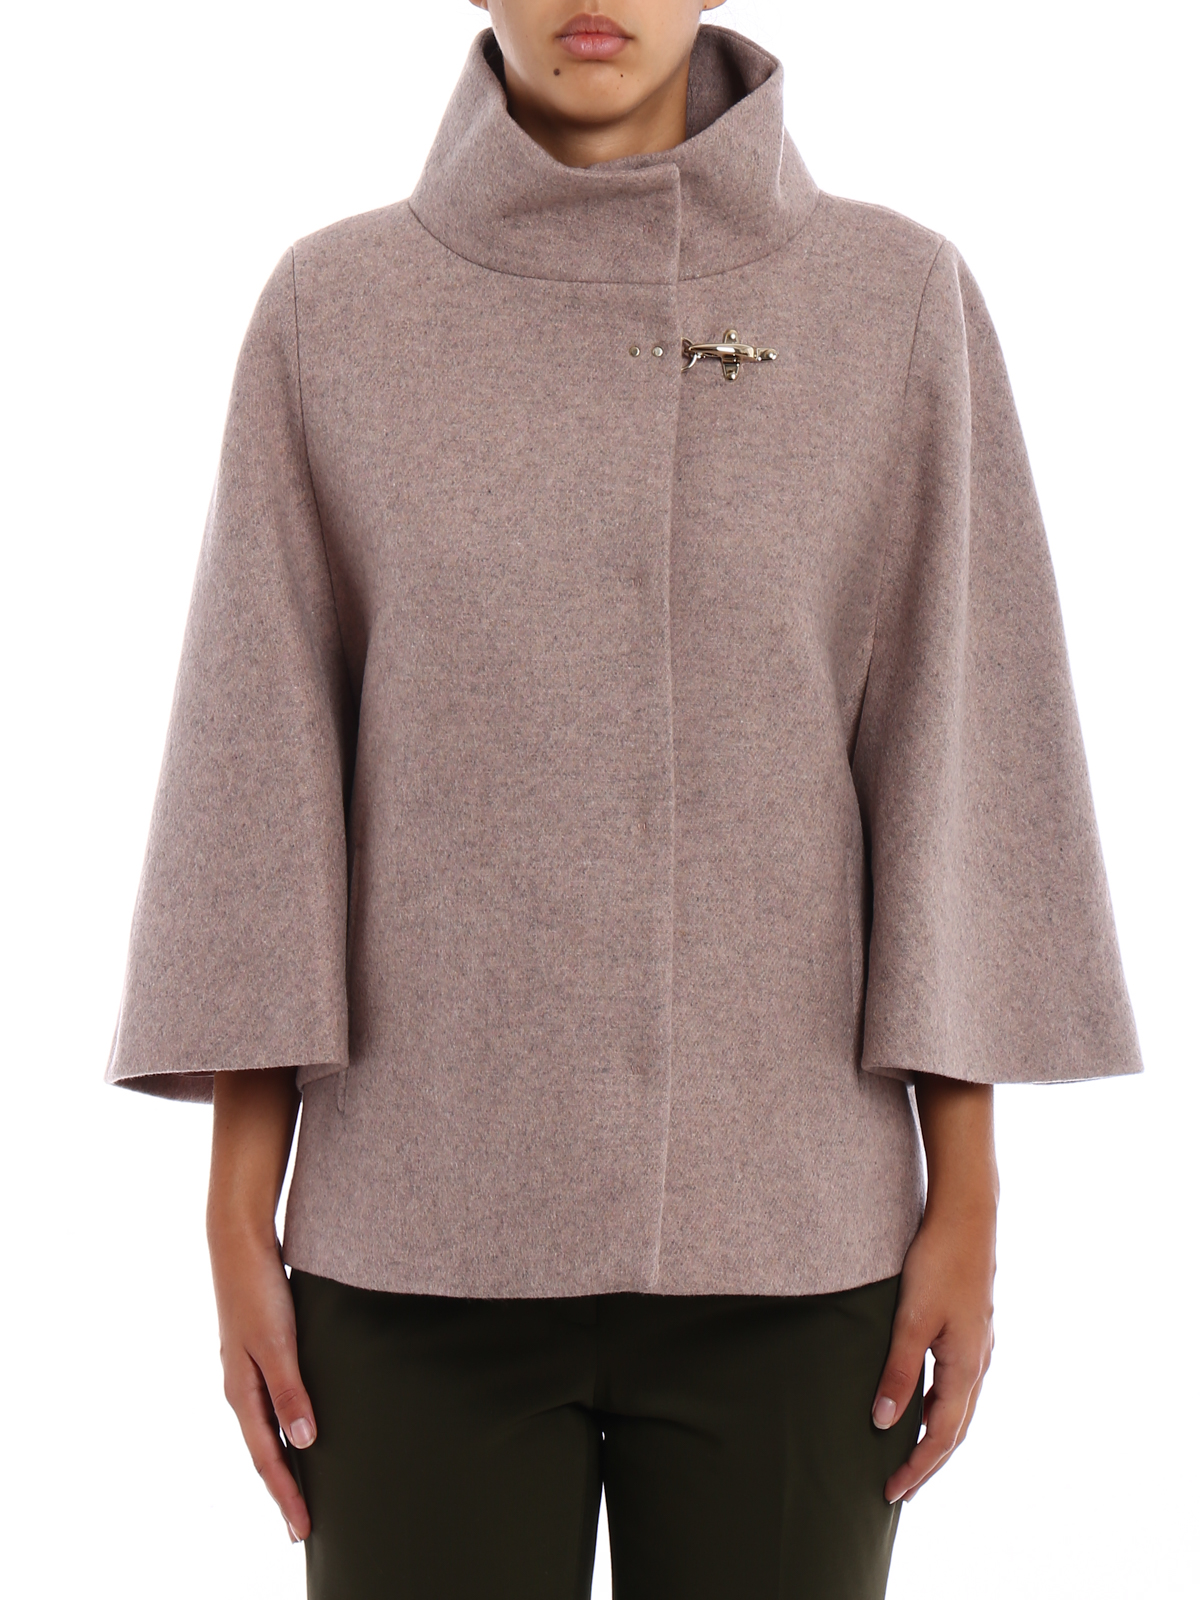 Ben noto Giacca misto lana stile mantella Fay - giacche casual | iKRIX NI21